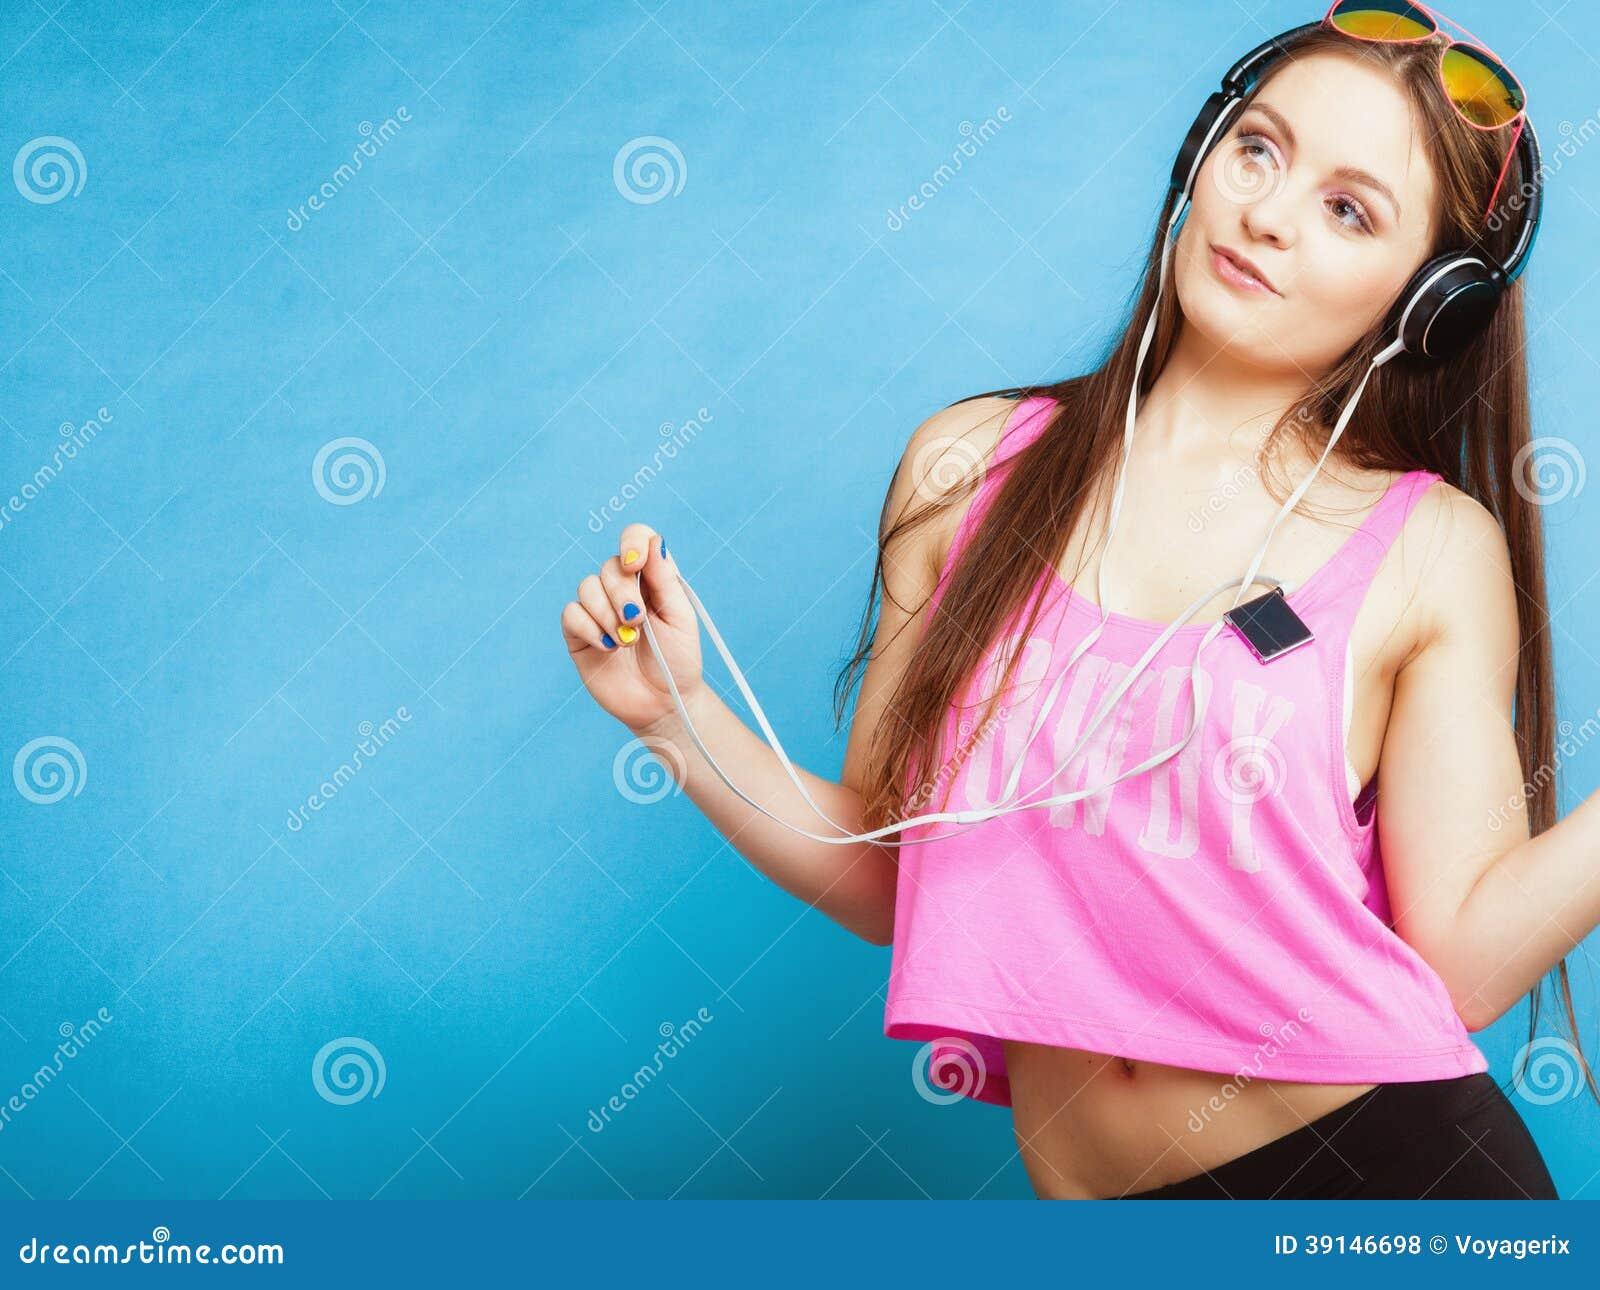 Teen might listen to music